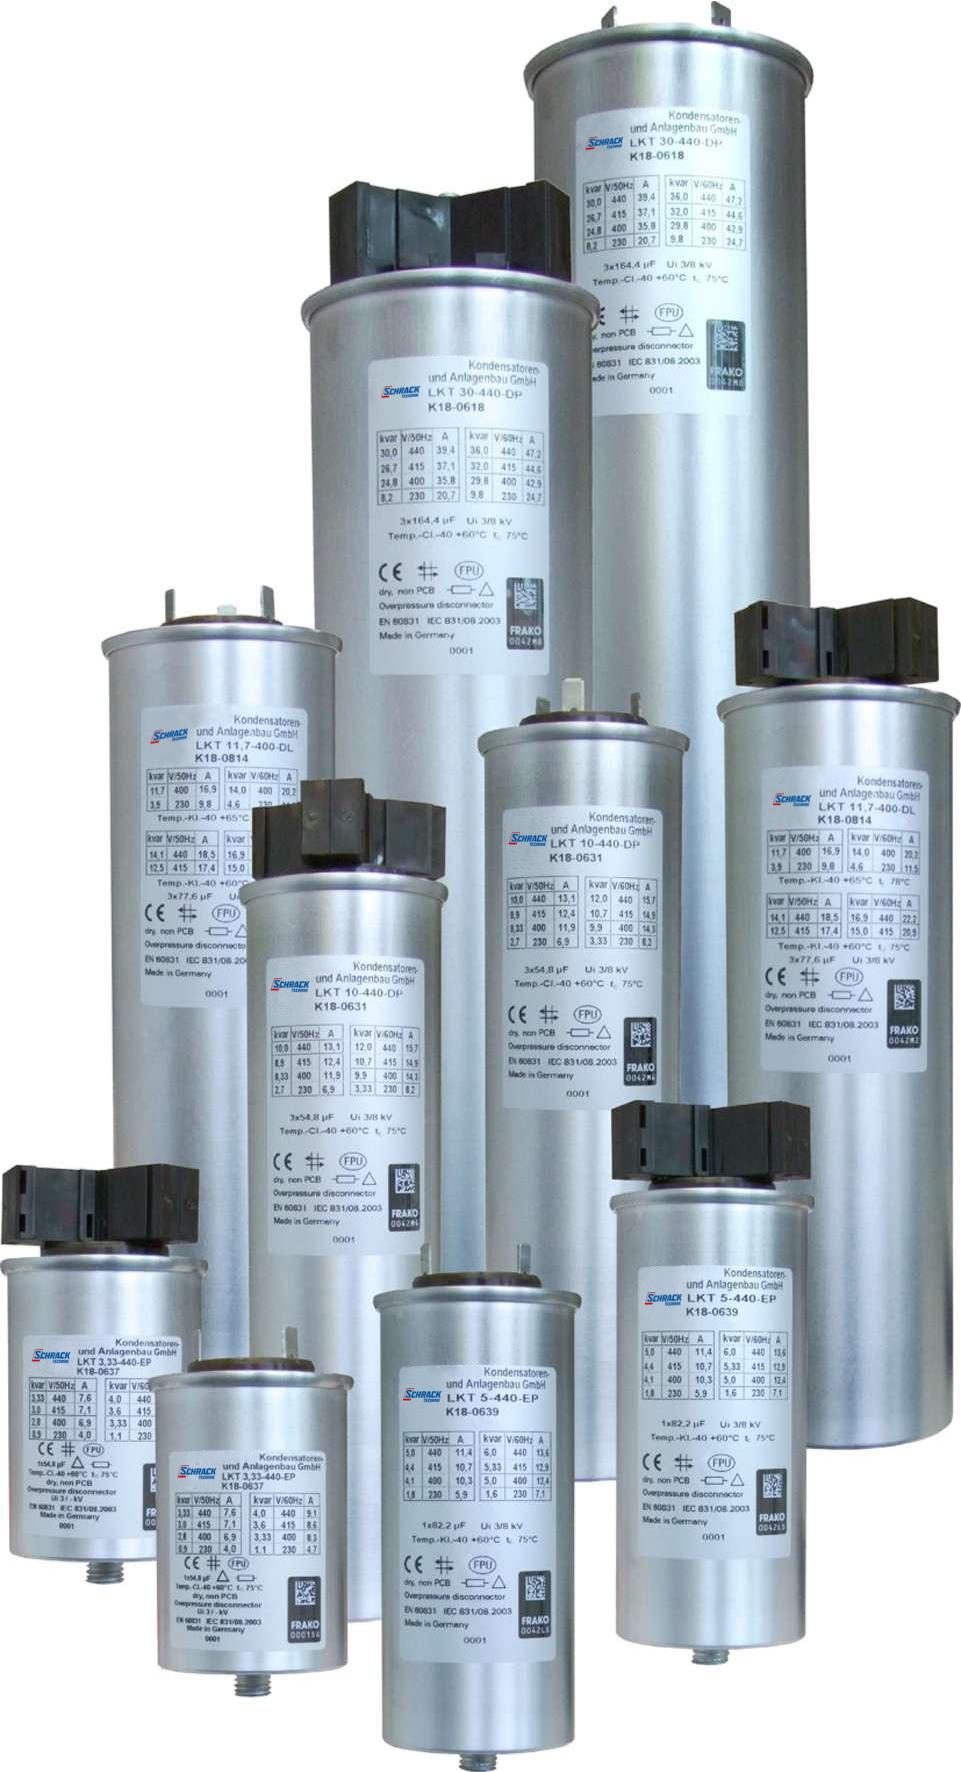 1 Stk Leistungskondensator 440V Qc=10,3kvar(400V)Qc=12,5kvar(440V) FRLK12544B